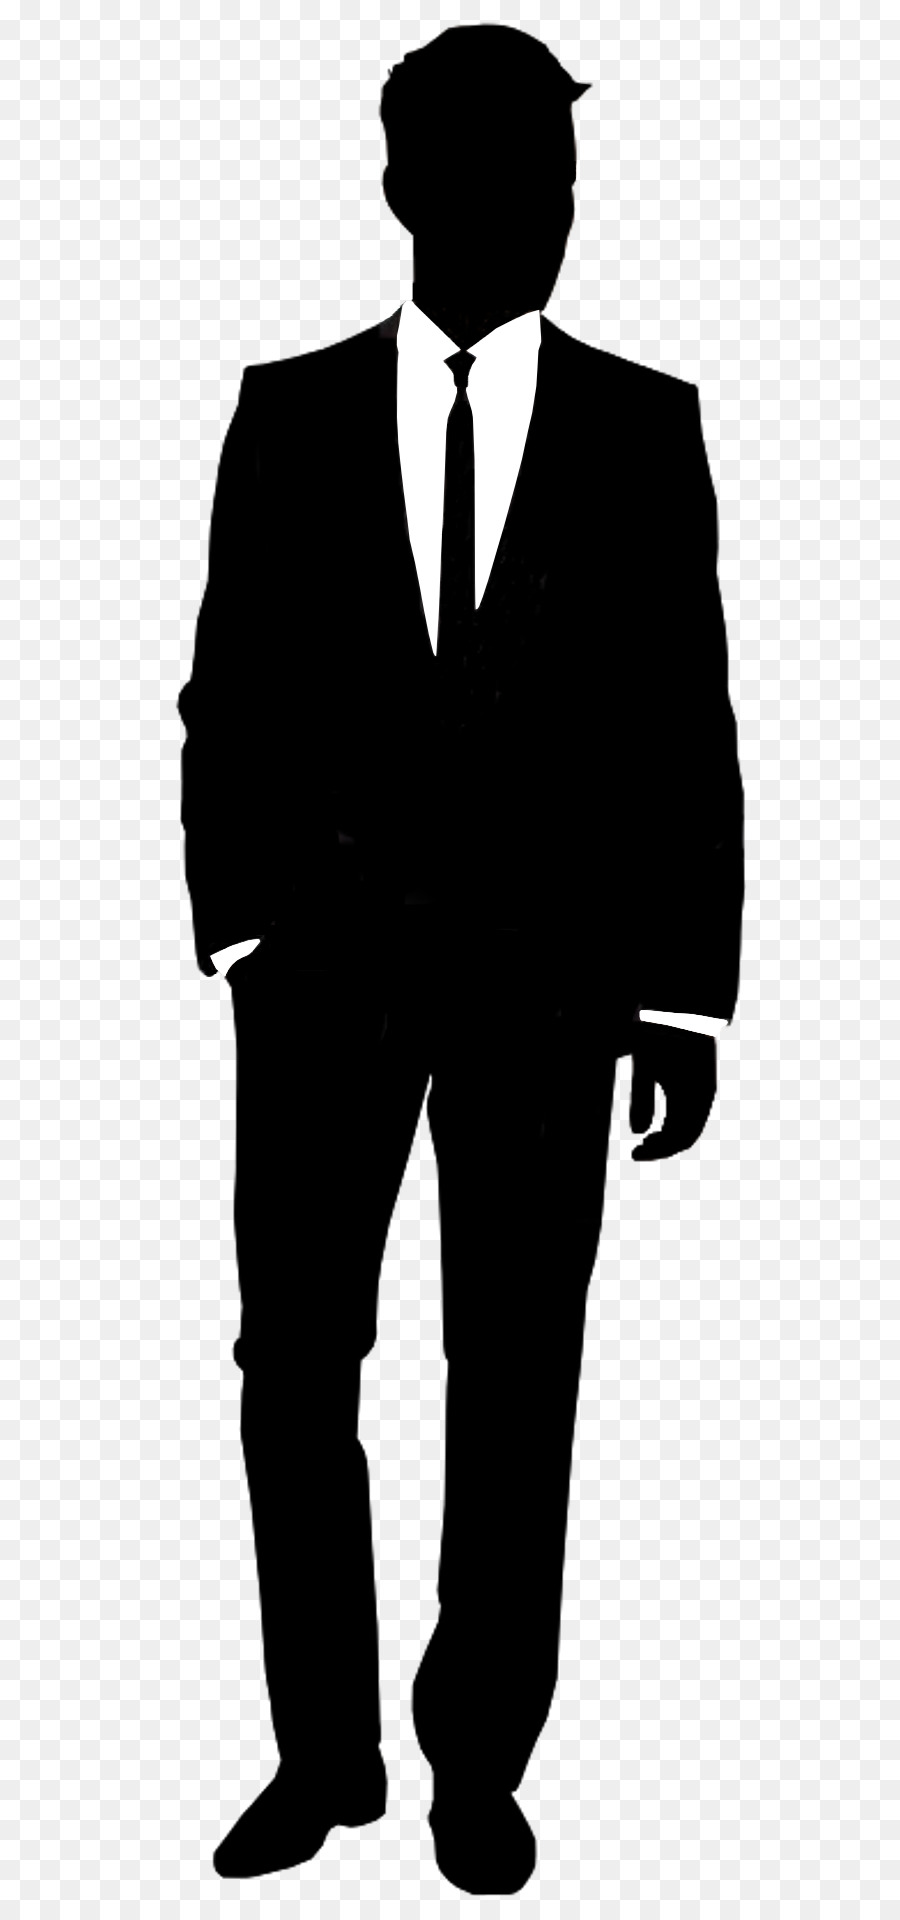 Suit Silhouette Shirt Informal attire - gentleman png ...